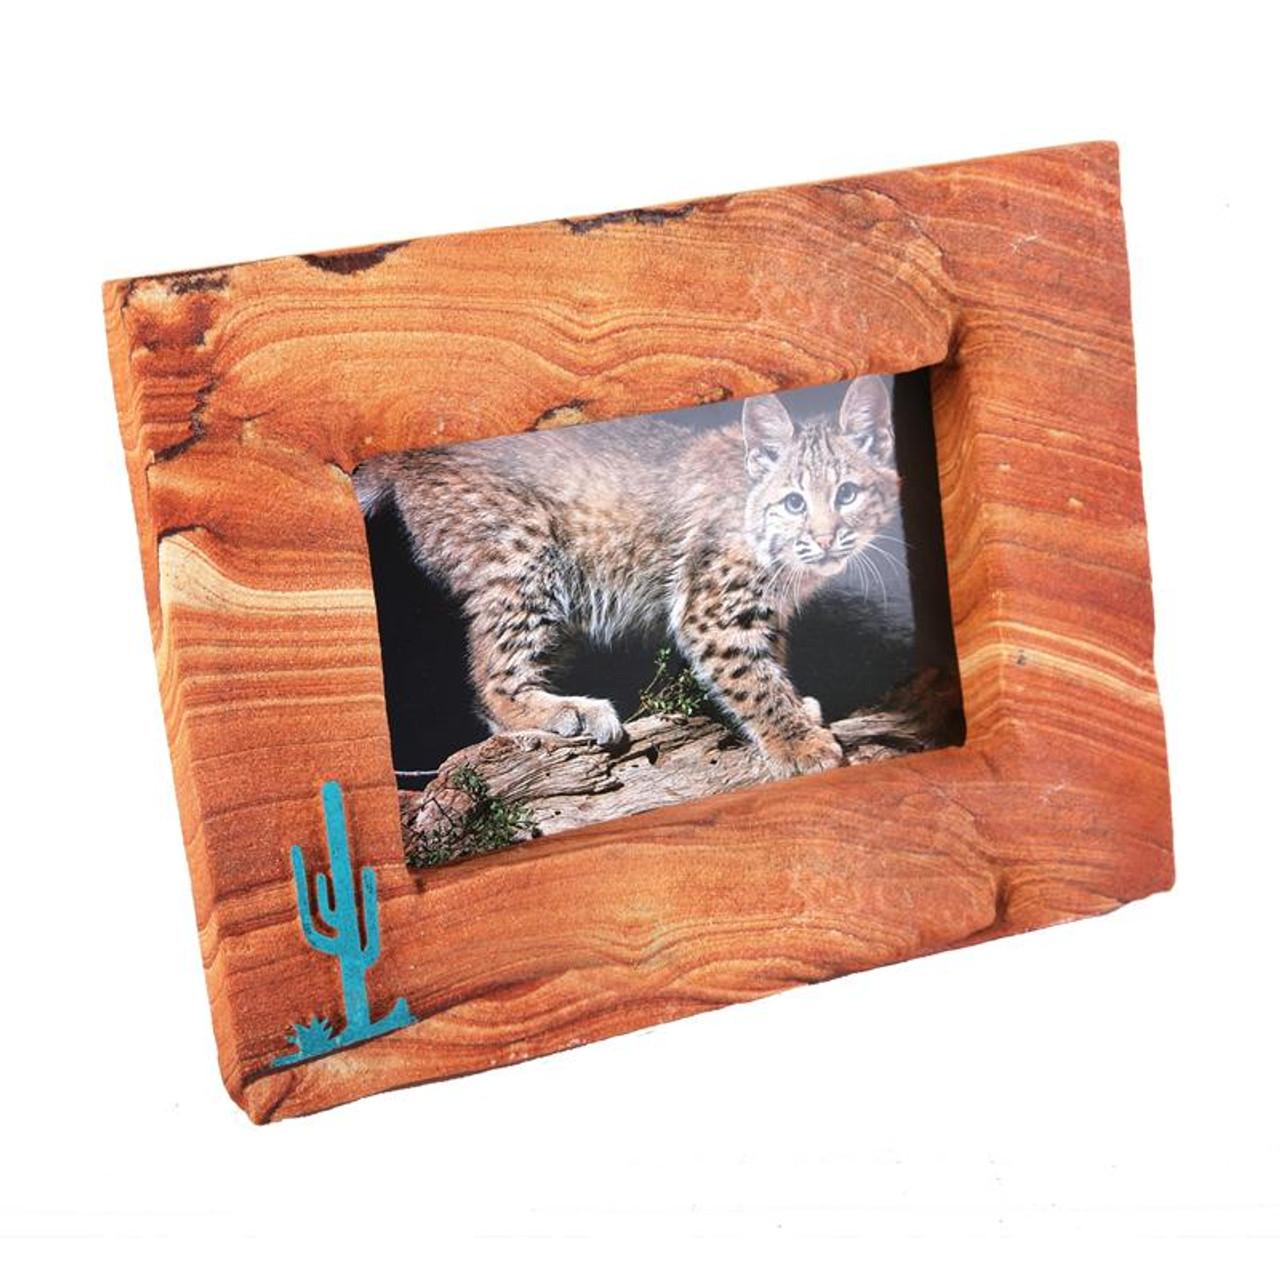 Sandstone Picture Frame w/Turquoise Saguaro - Landscape